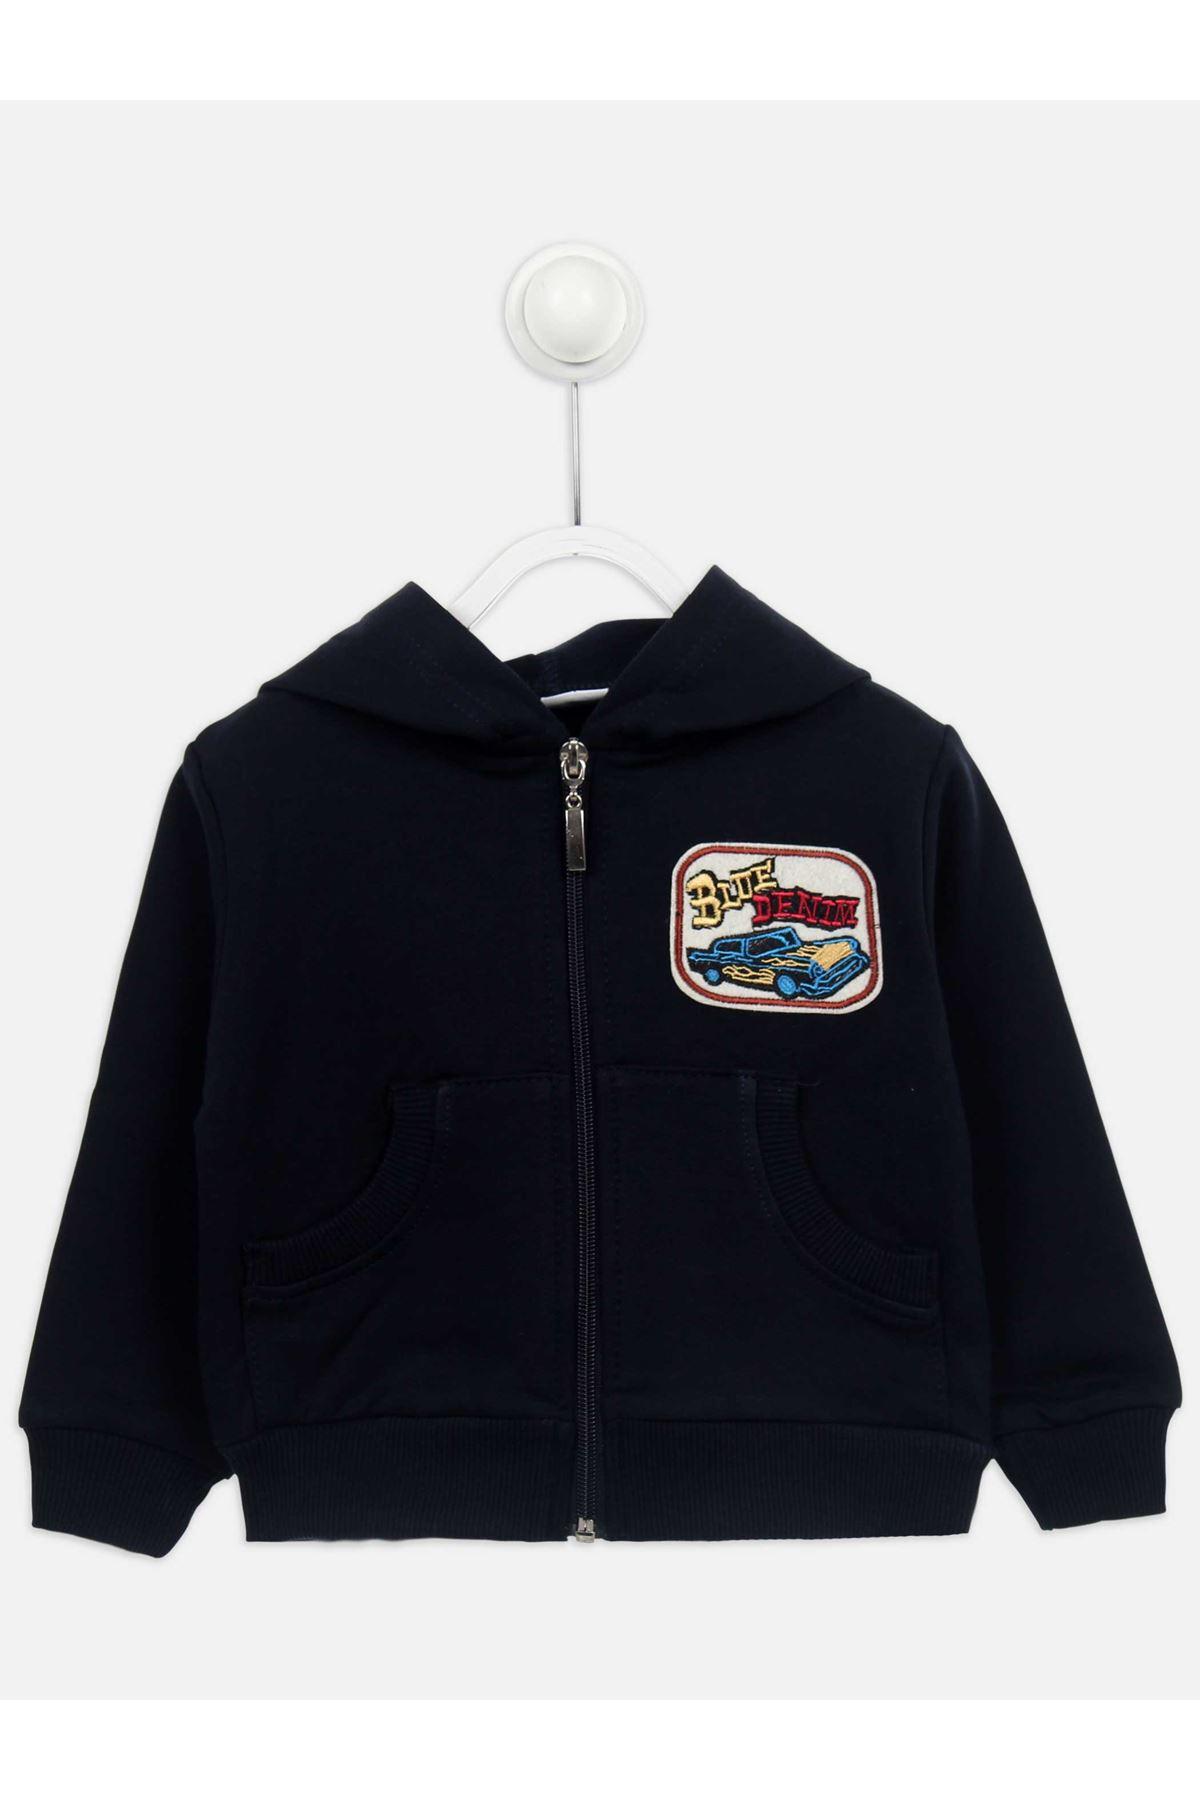 Dark Navy Blue Seasonal Male Child Sweatshirt